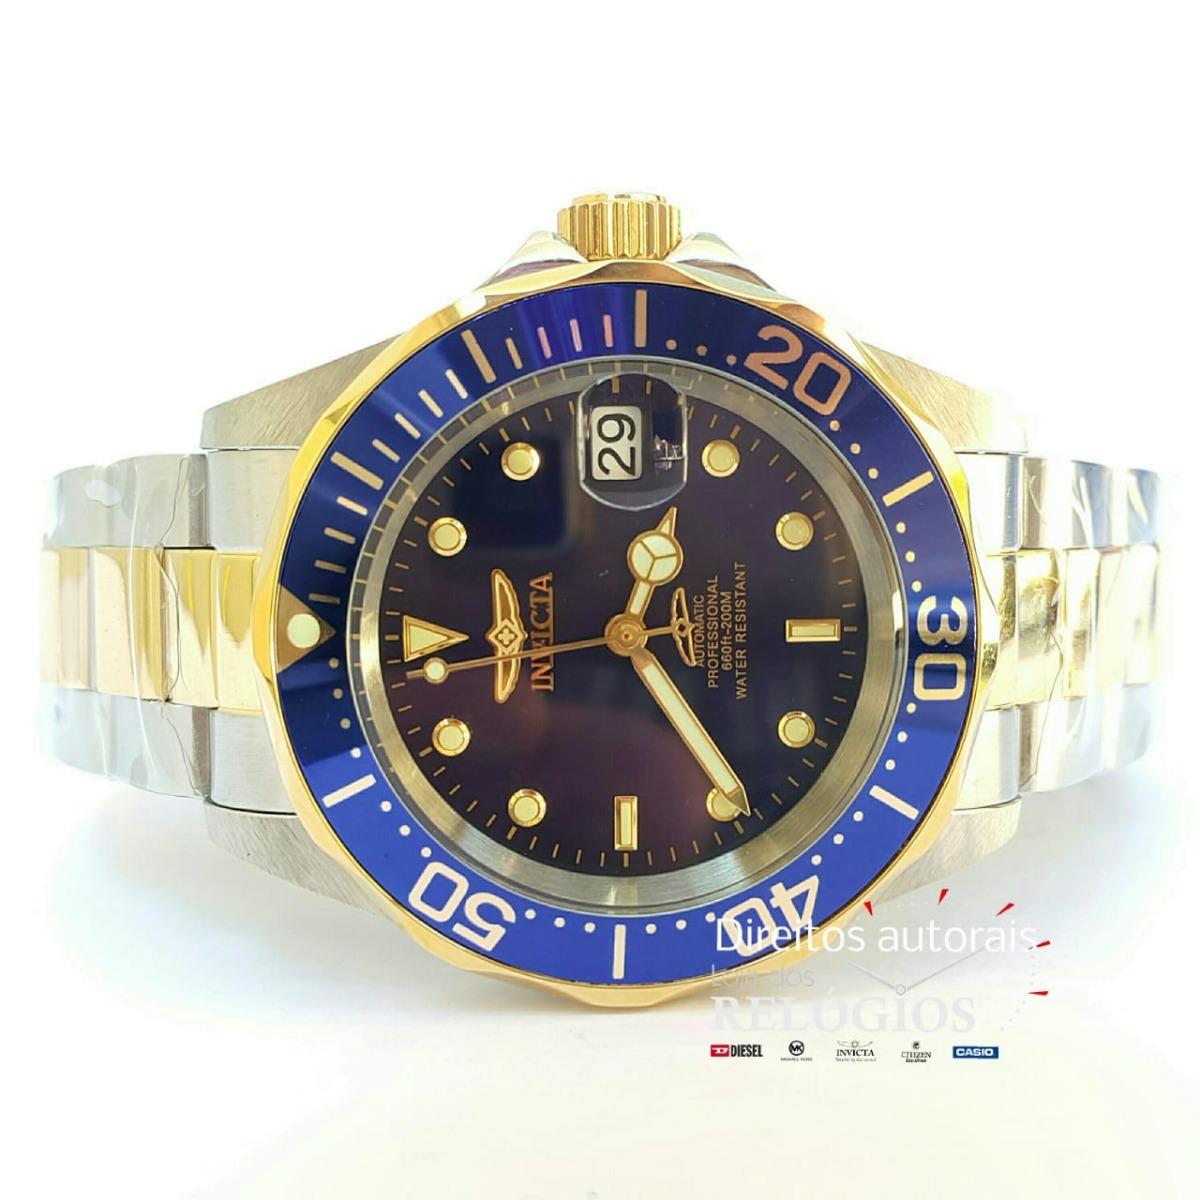 20d4bfeb64d Relógio Invicta Pro Diver Mod 8928 Original Preto Rolex - R  629